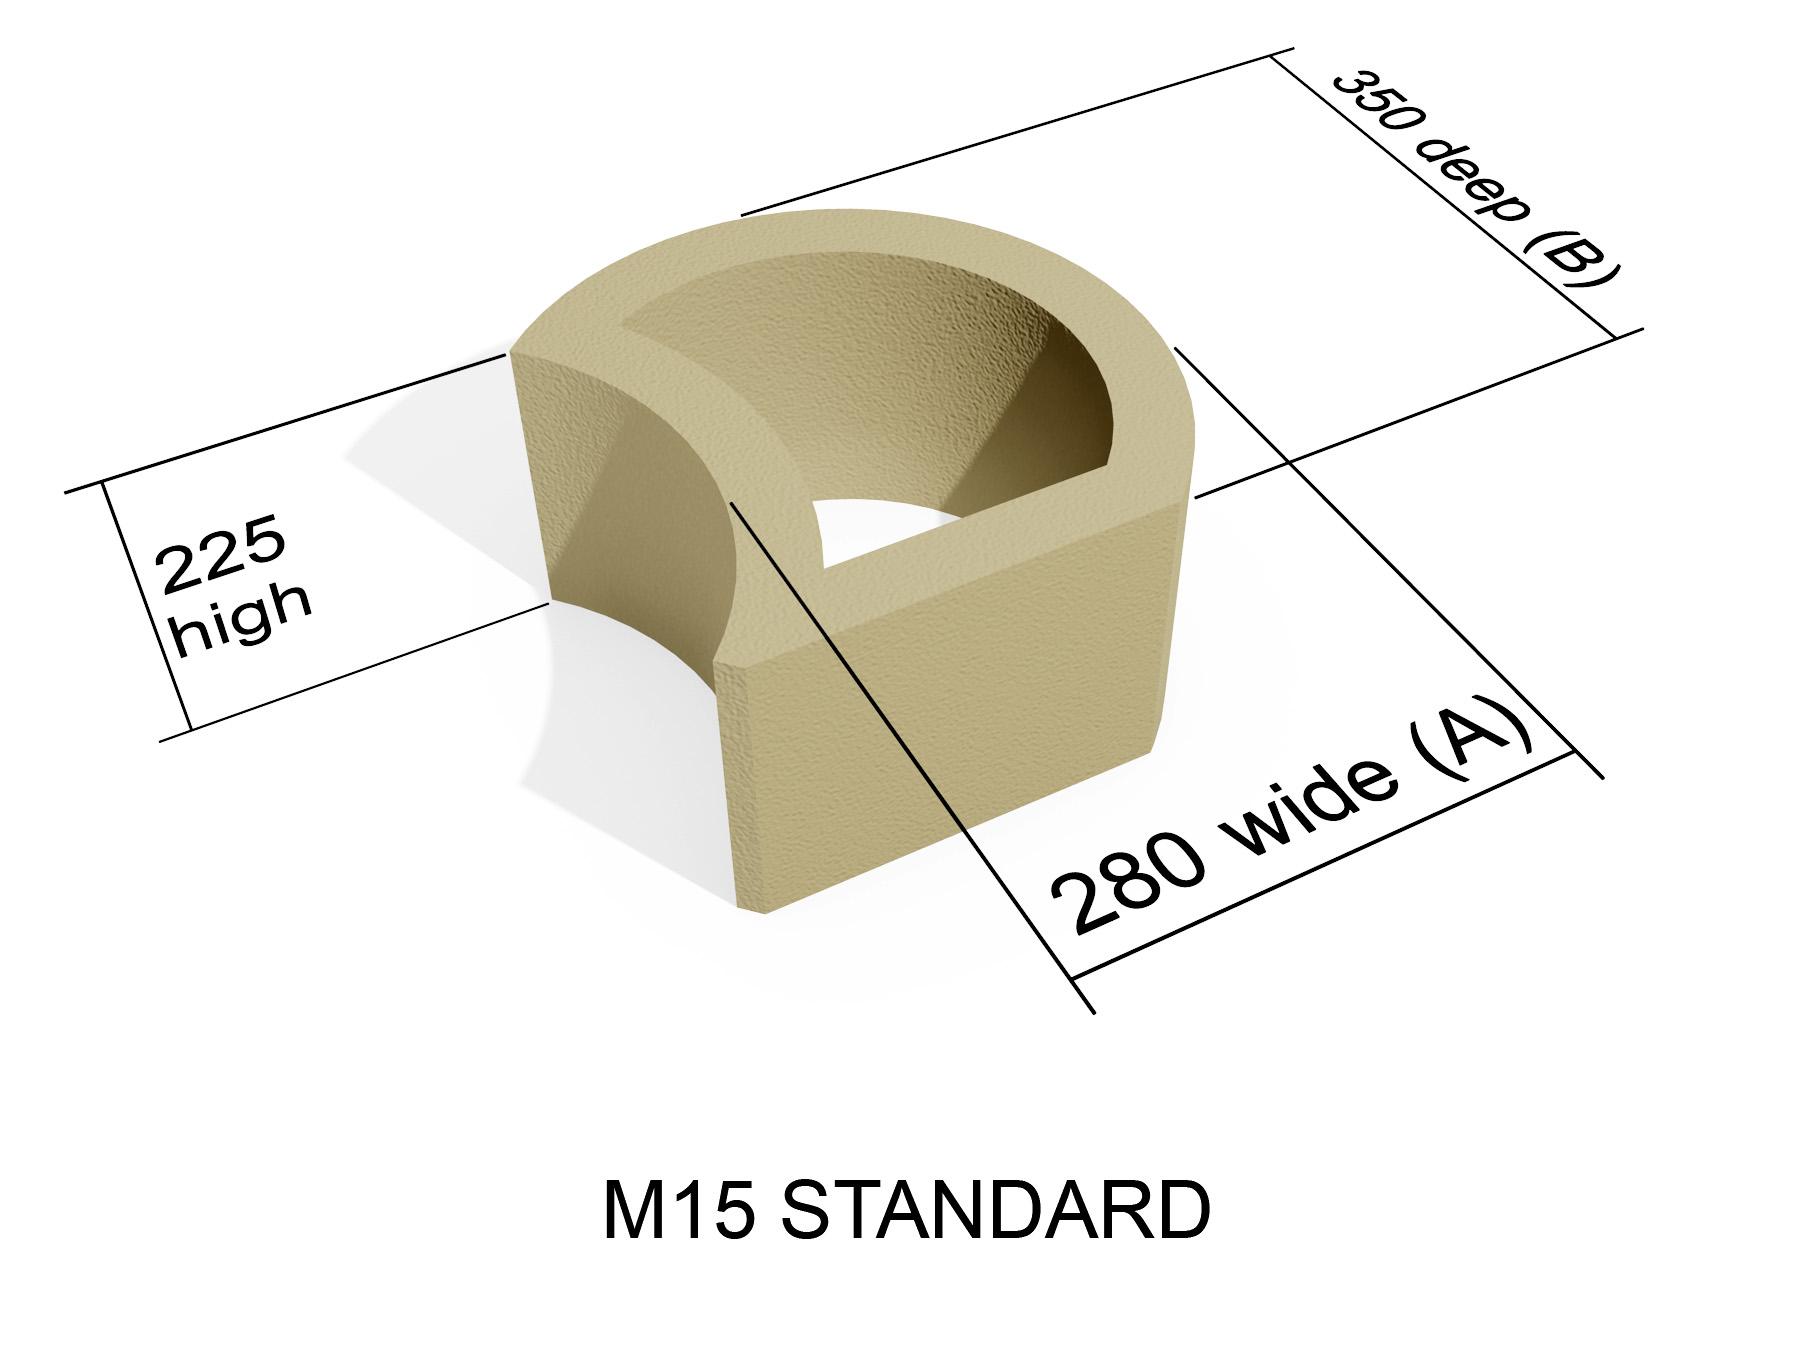 M15 smooth face retaining block